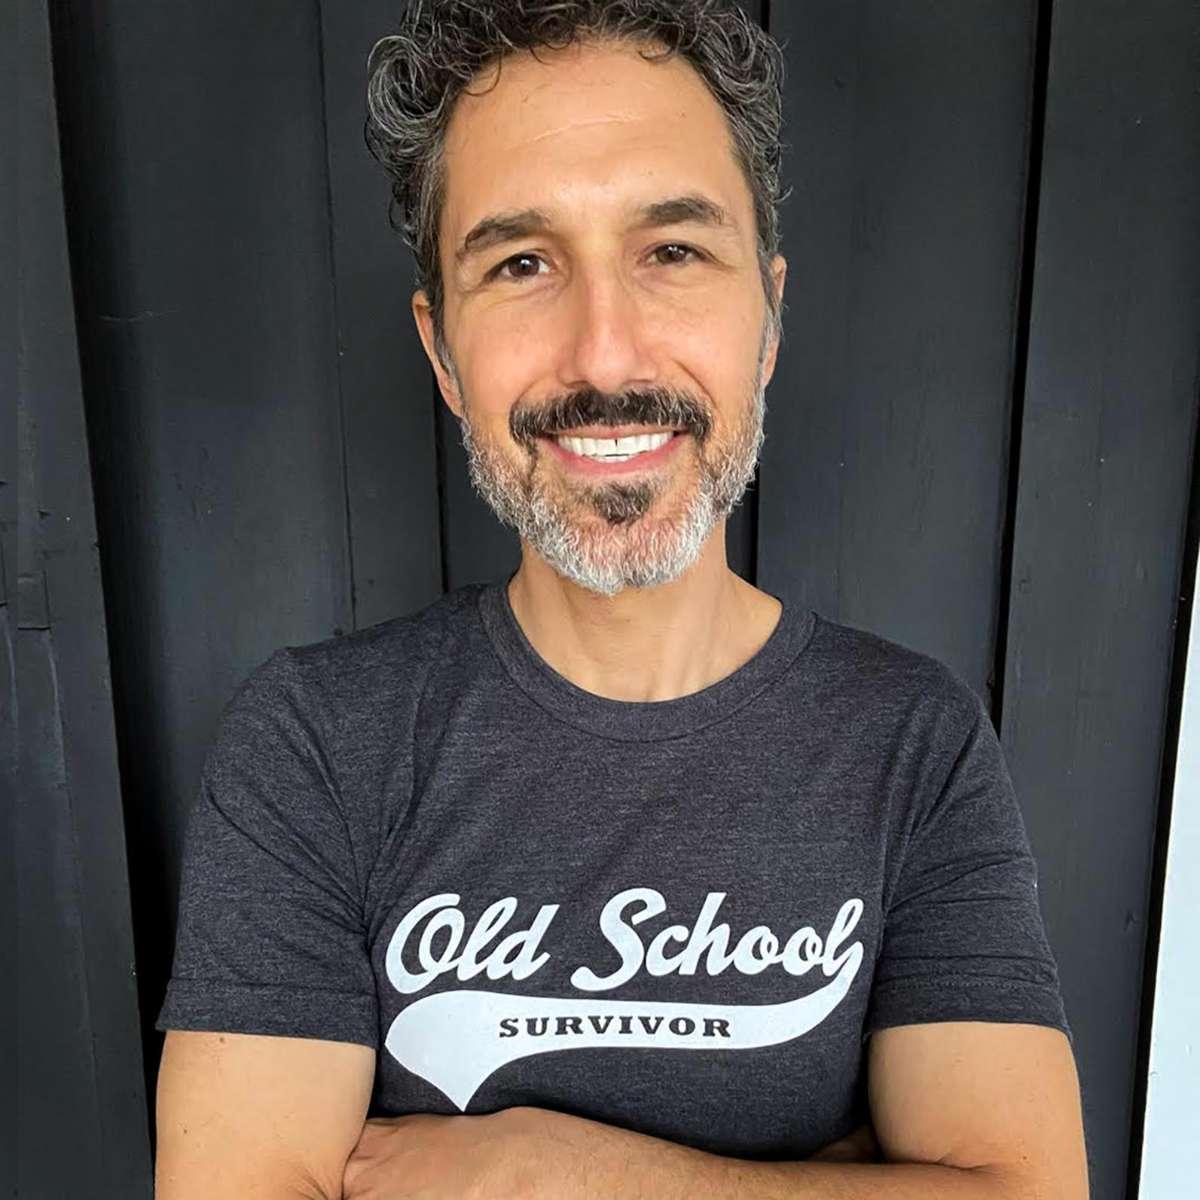 Old School Survivor - T-shirt